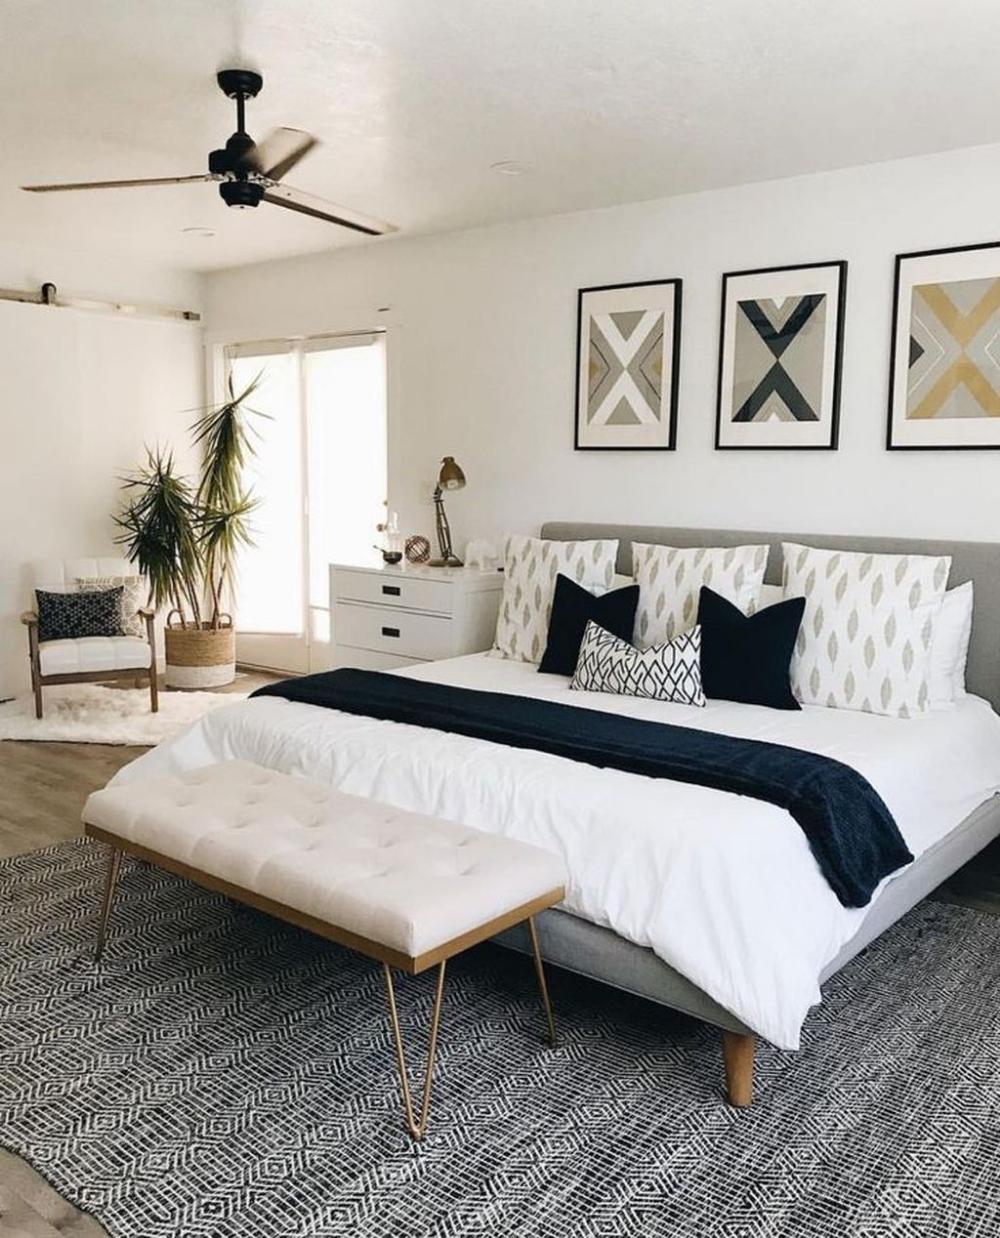 Photo of 65 fantastiske hvite ideer til hovedsoverommet matcher for ethvert boligdesign 2019 side 47 »…